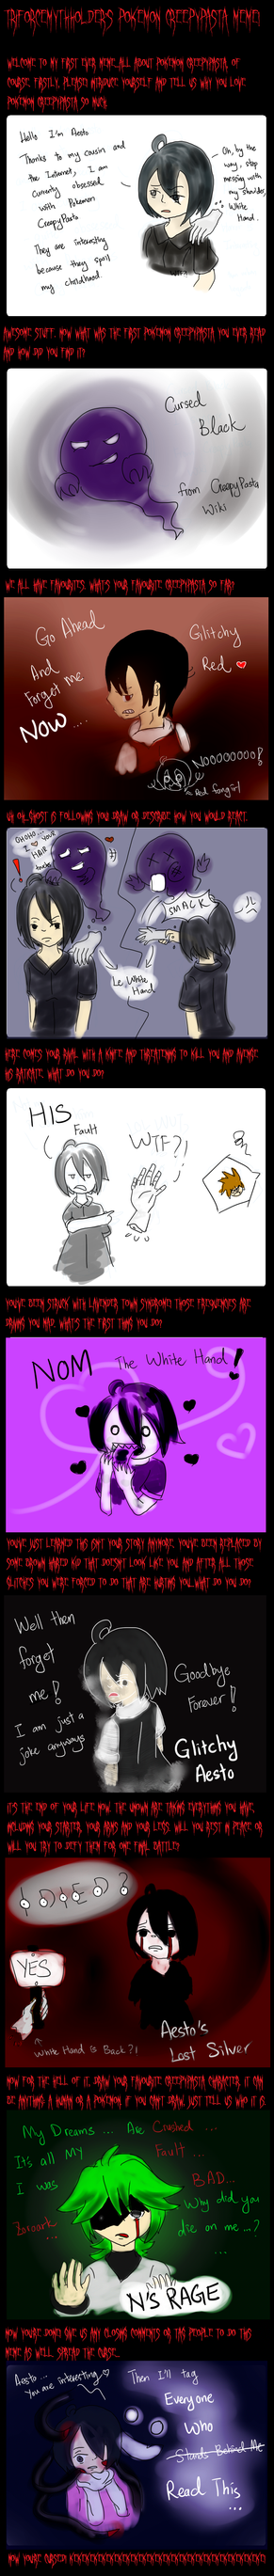 Pokemon CreepyPasta Meme by Aestoria